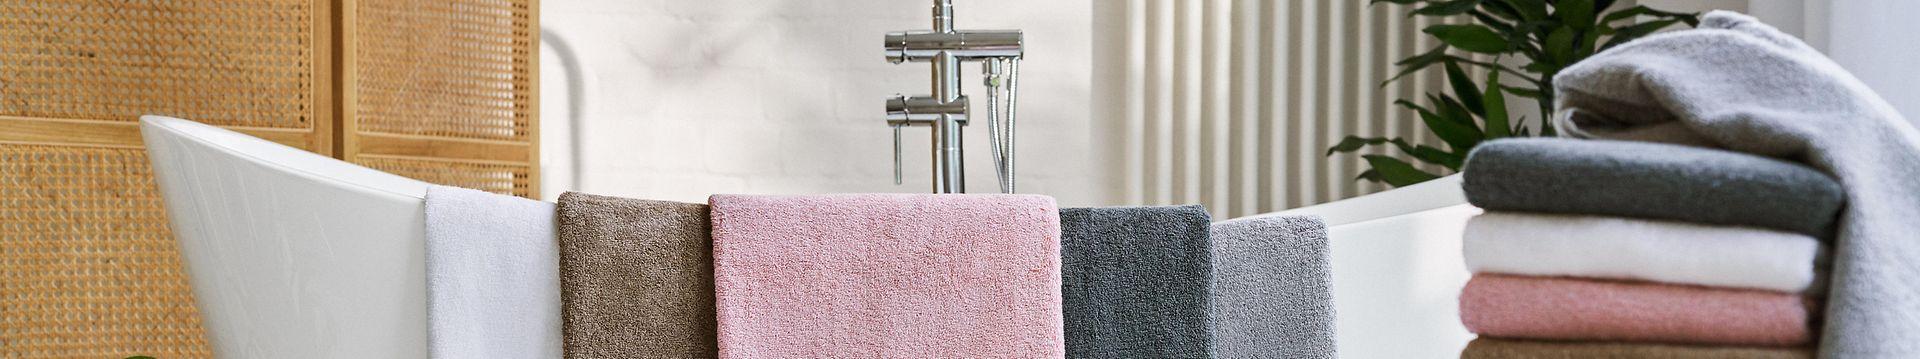 102021 - Home - Bathroom - TC Banner - IMG (3)